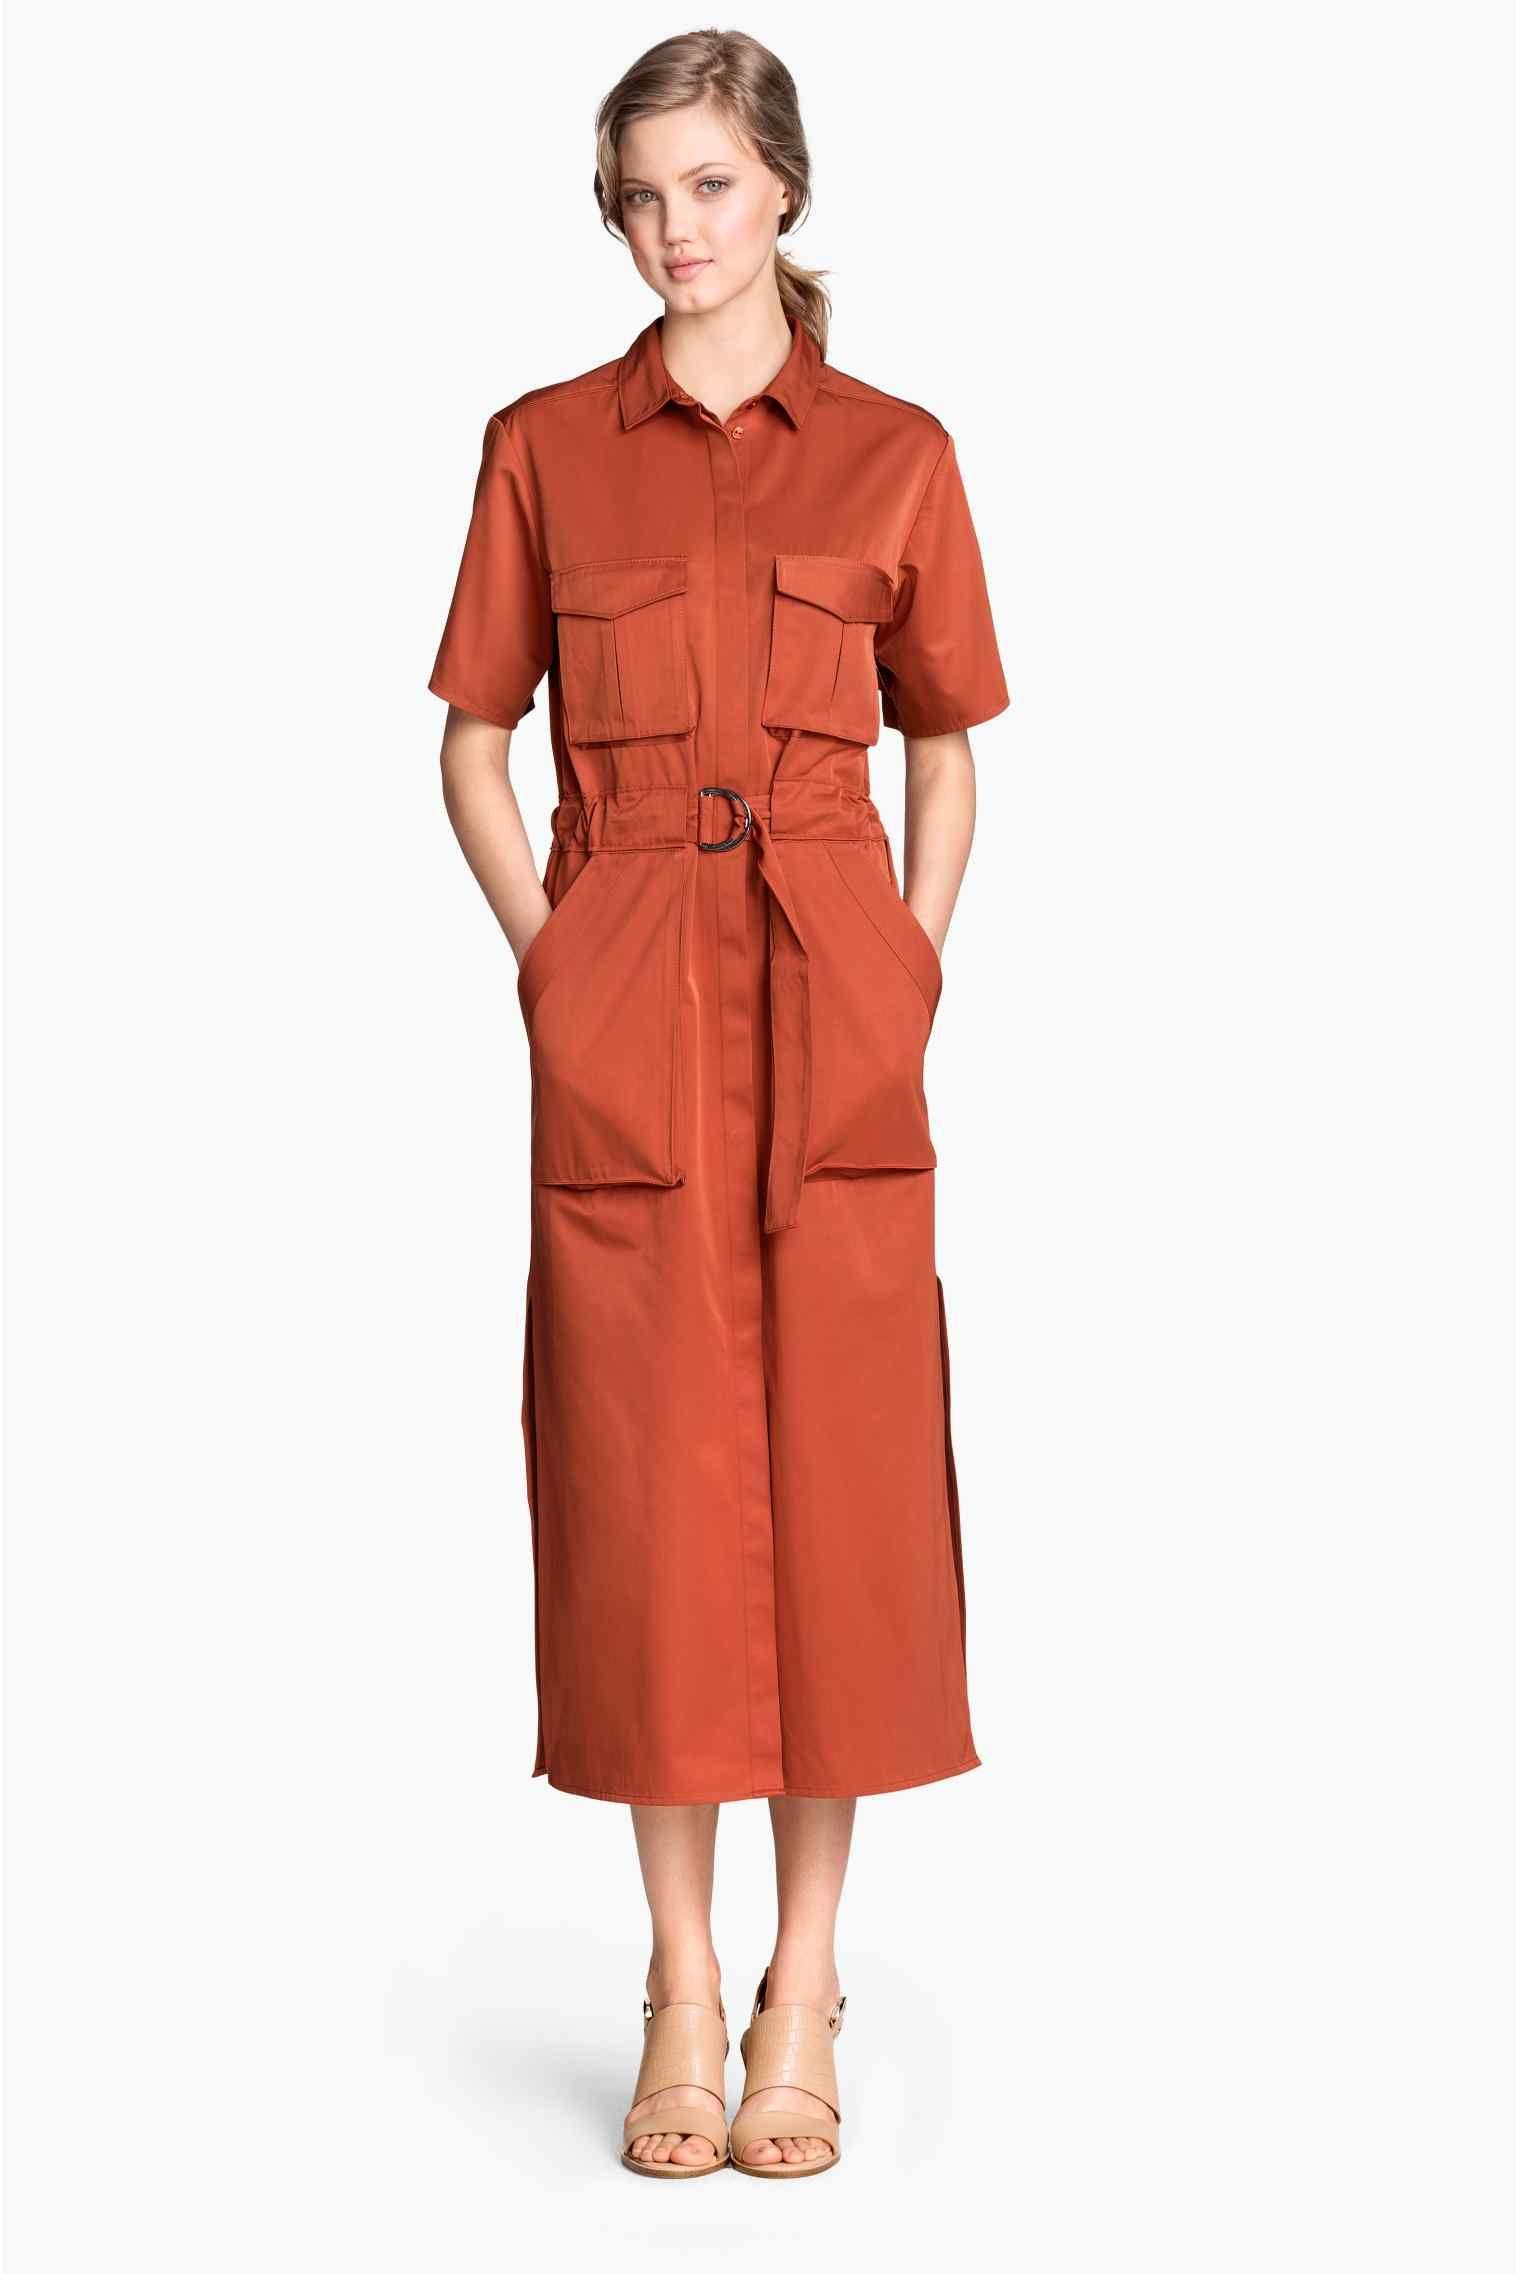 robe chemise longue h m robe saharienne pinterest robe chemise longue chemise longue et. Black Bedroom Furniture Sets. Home Design Ideas